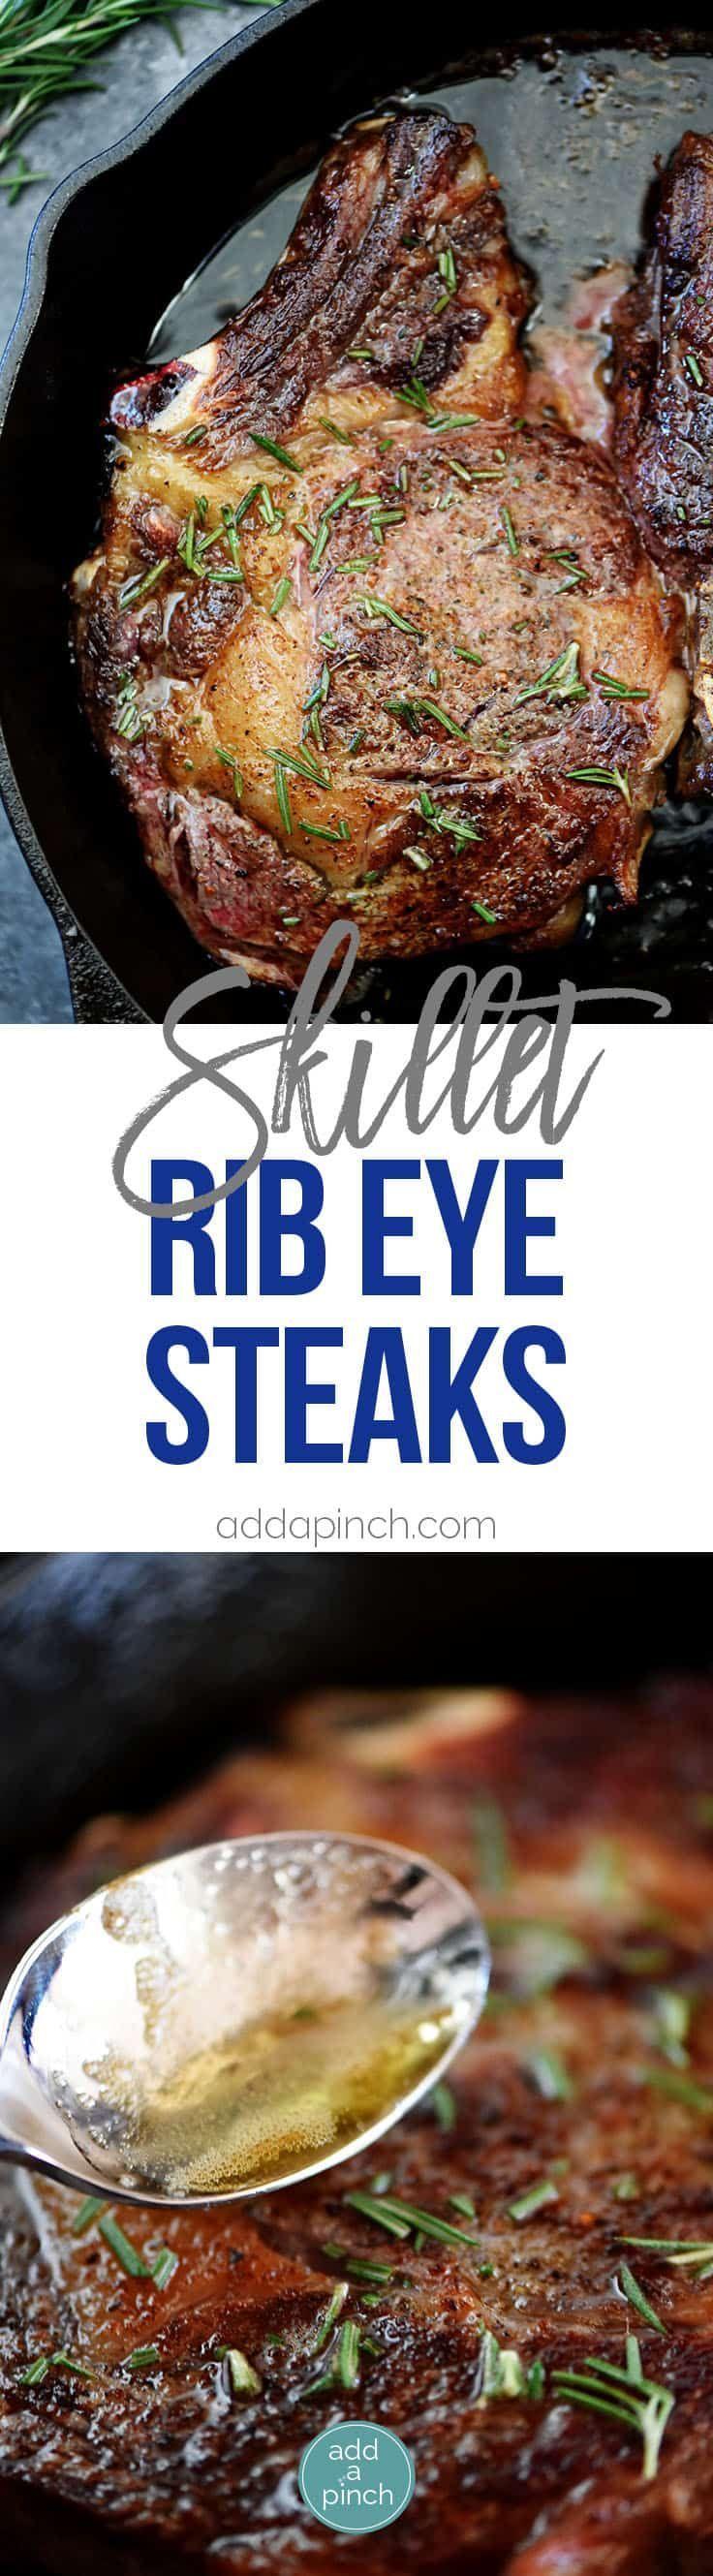 Skillet Rib Eye Steaks Recipe - Butter-basted skillet rib ...